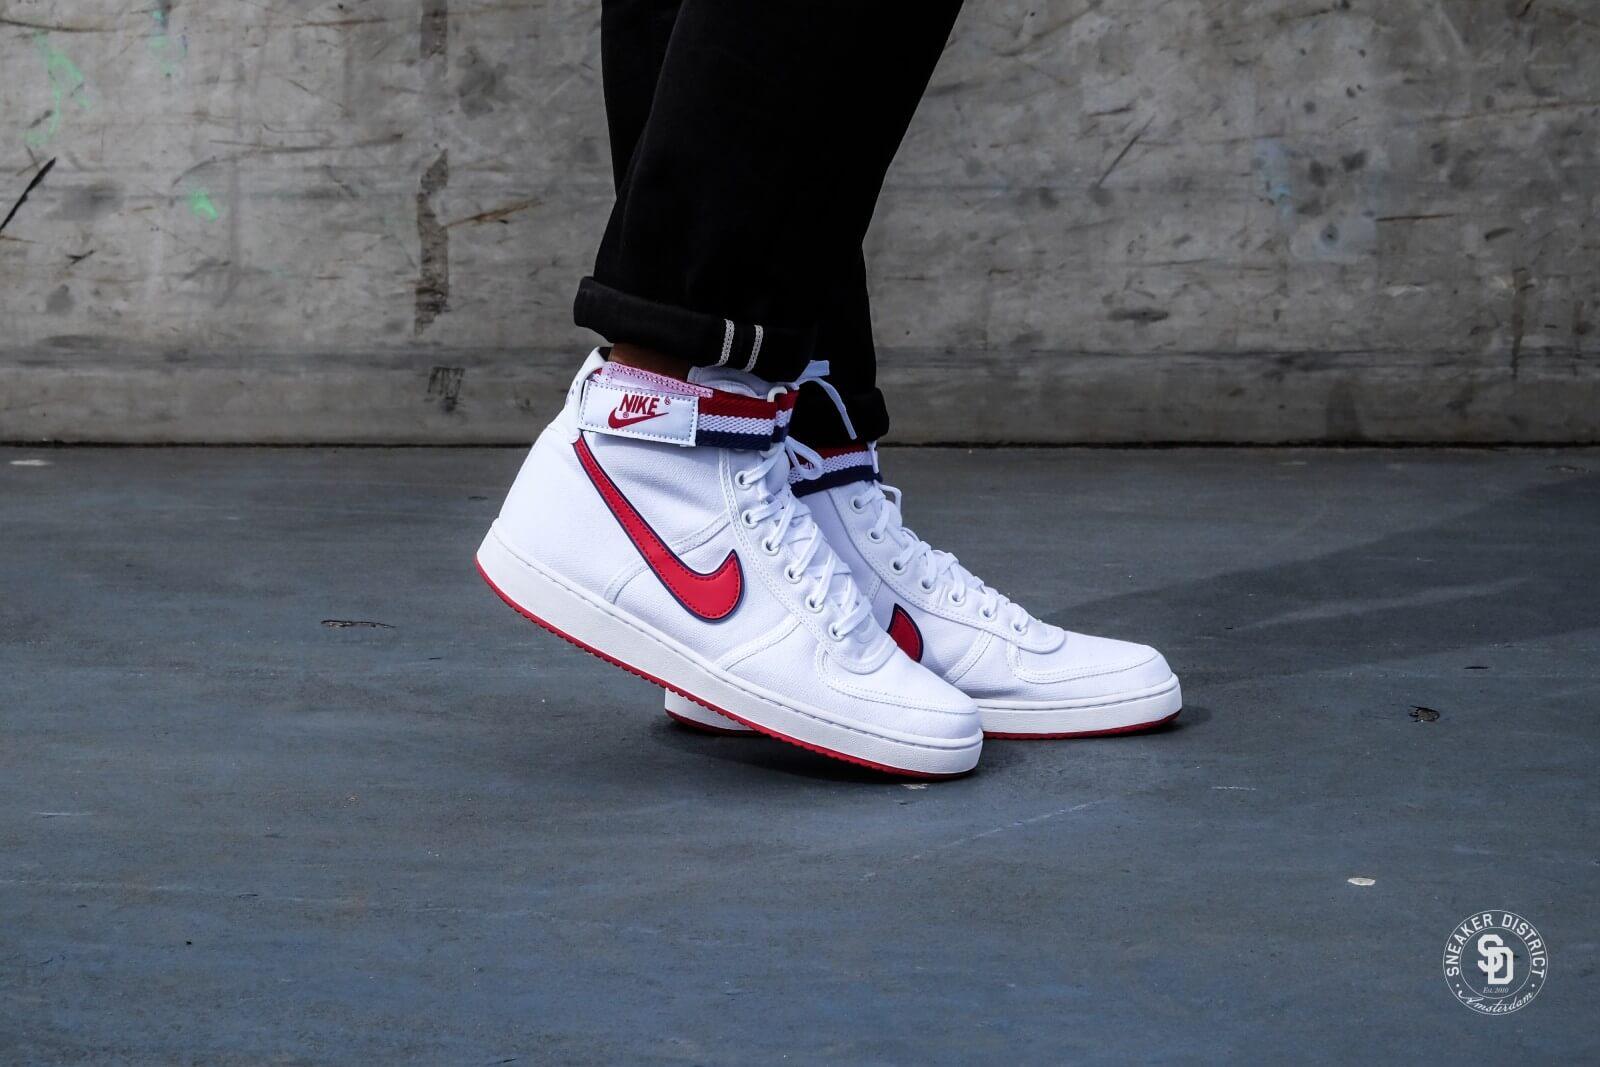 Nike Vandal High Supreme White/Gym Red